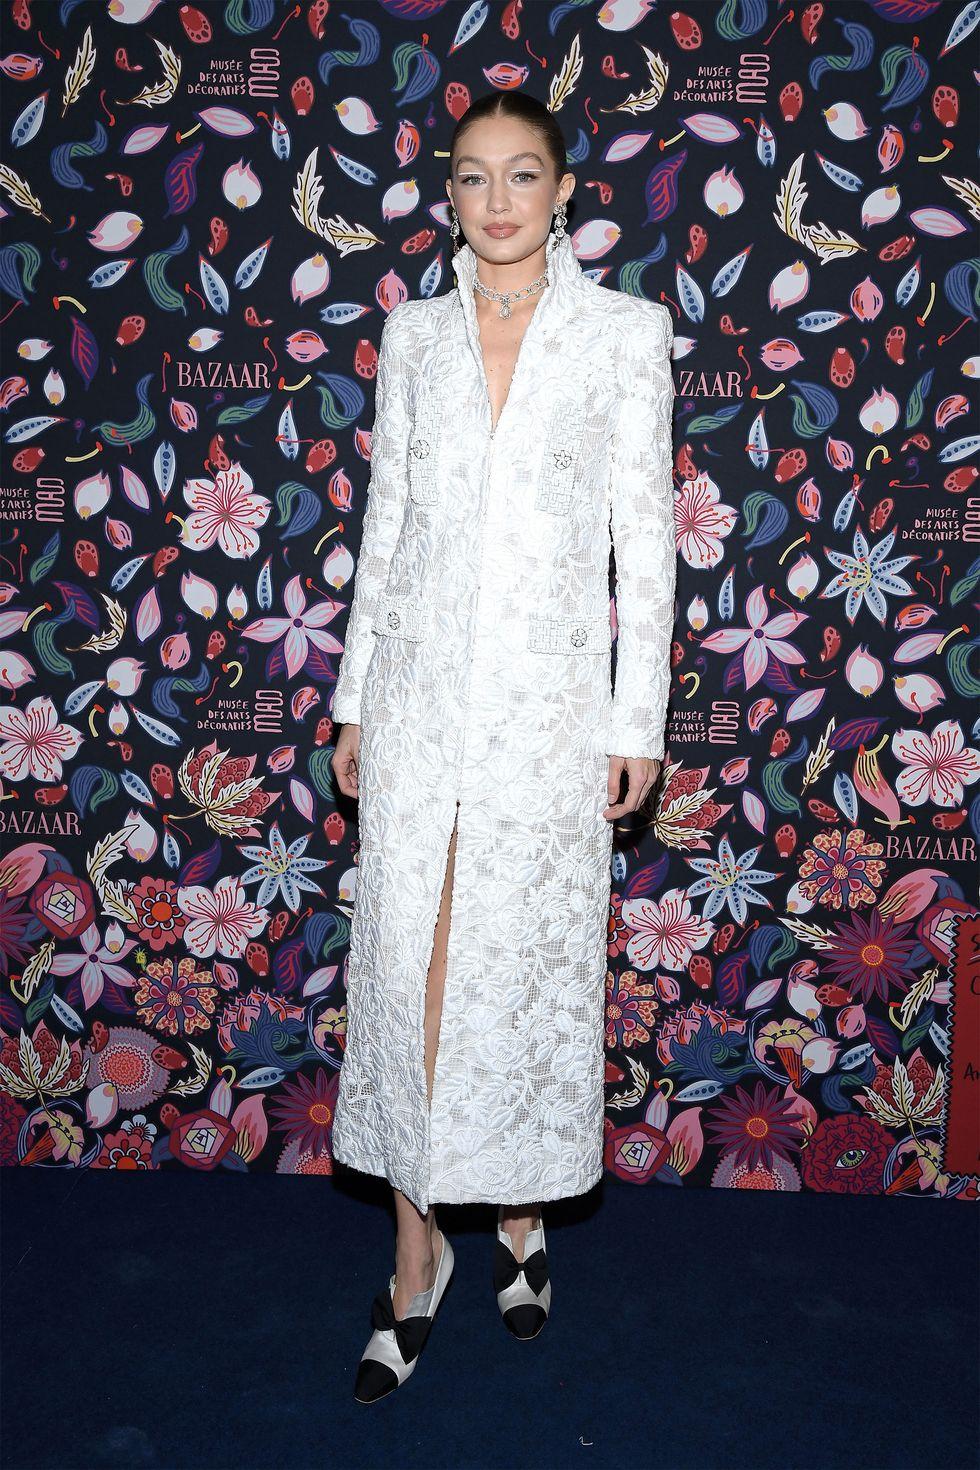 gigi-hadid-in-chanel-haute-couture-the-harpers-bazaar-exhibition-2020